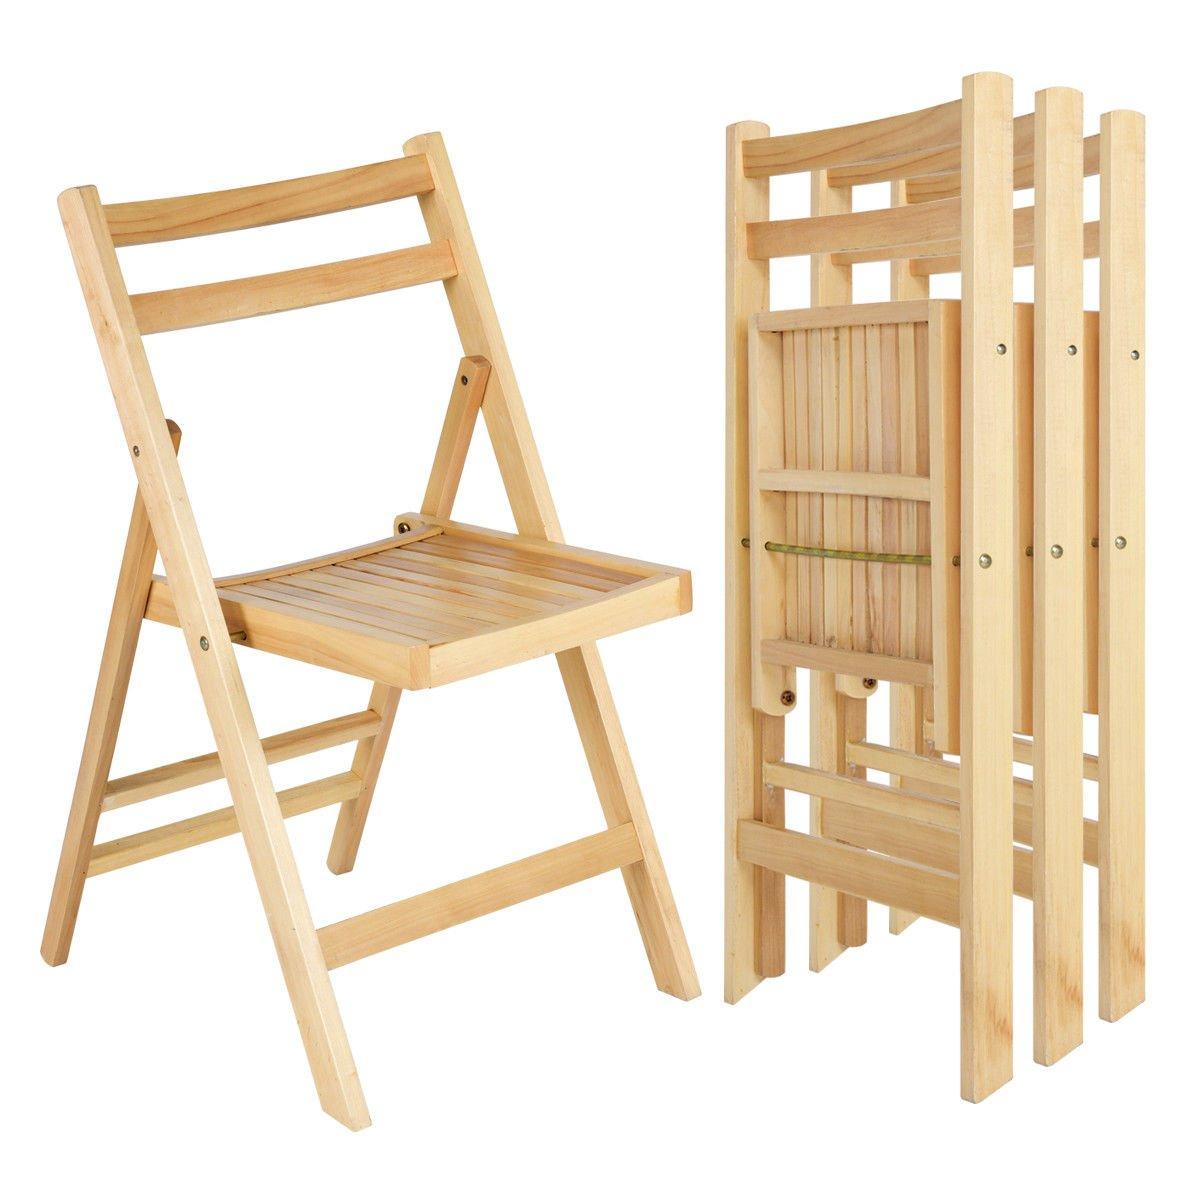 Giantex 4 Pcs Solid Wood Folding Chairs Ergonomic Slatted Seat Backrest Wedding Patio Garden Home Furniture (Natural)